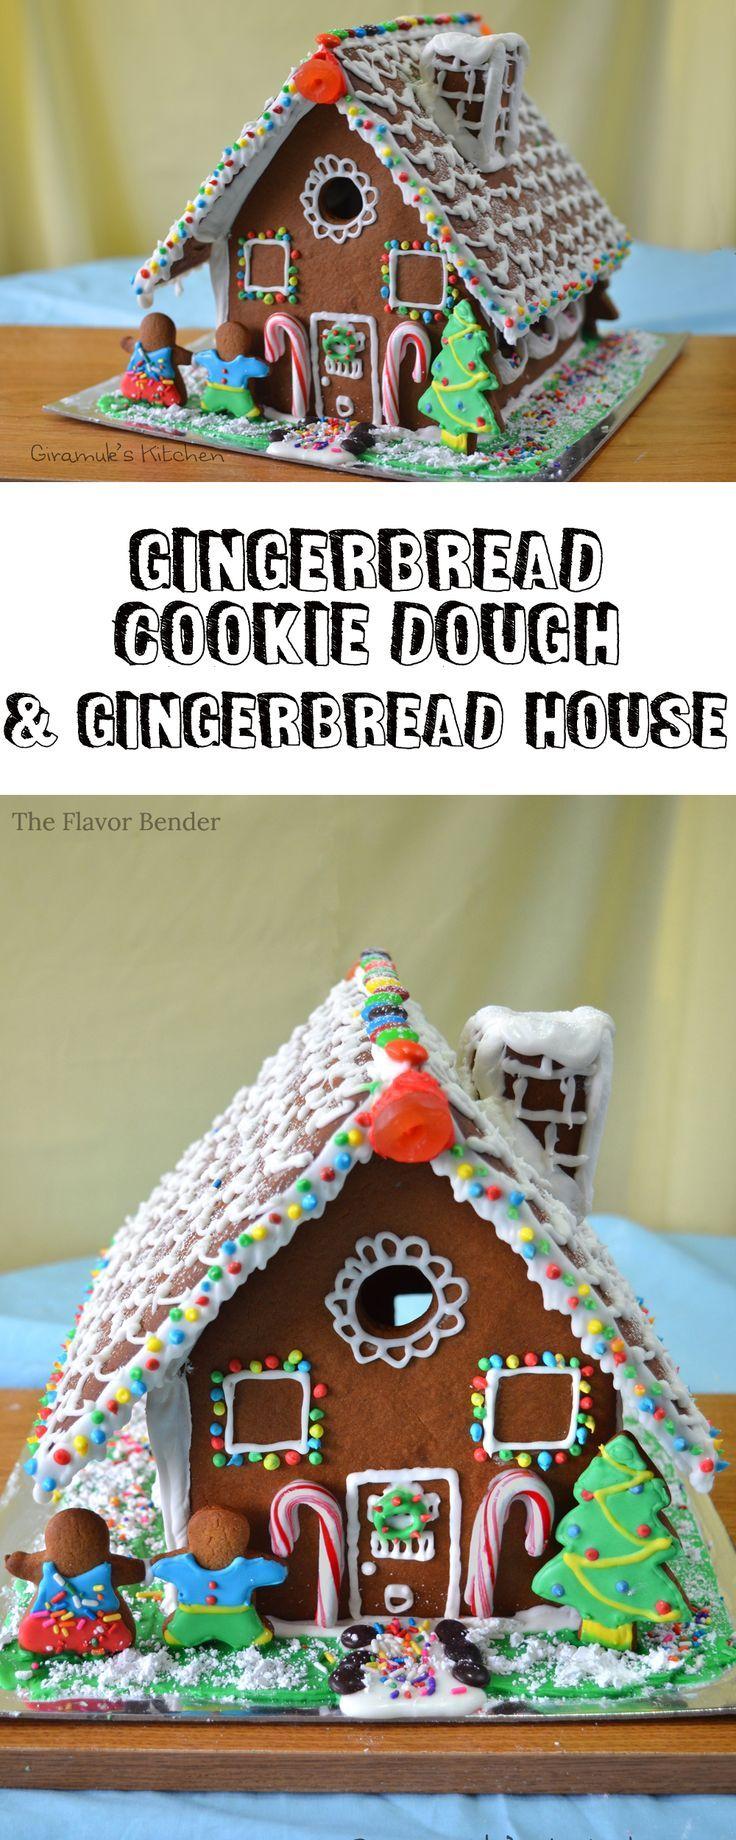 Gingerbread House {Recipe & Template} | The Flavor Bender (scheduled via http://www.tailwindapp.com?utm_source=pinterest&utm_medium=twpin&utm_content=post21176466&utm_campaign=scheduler_attribution)